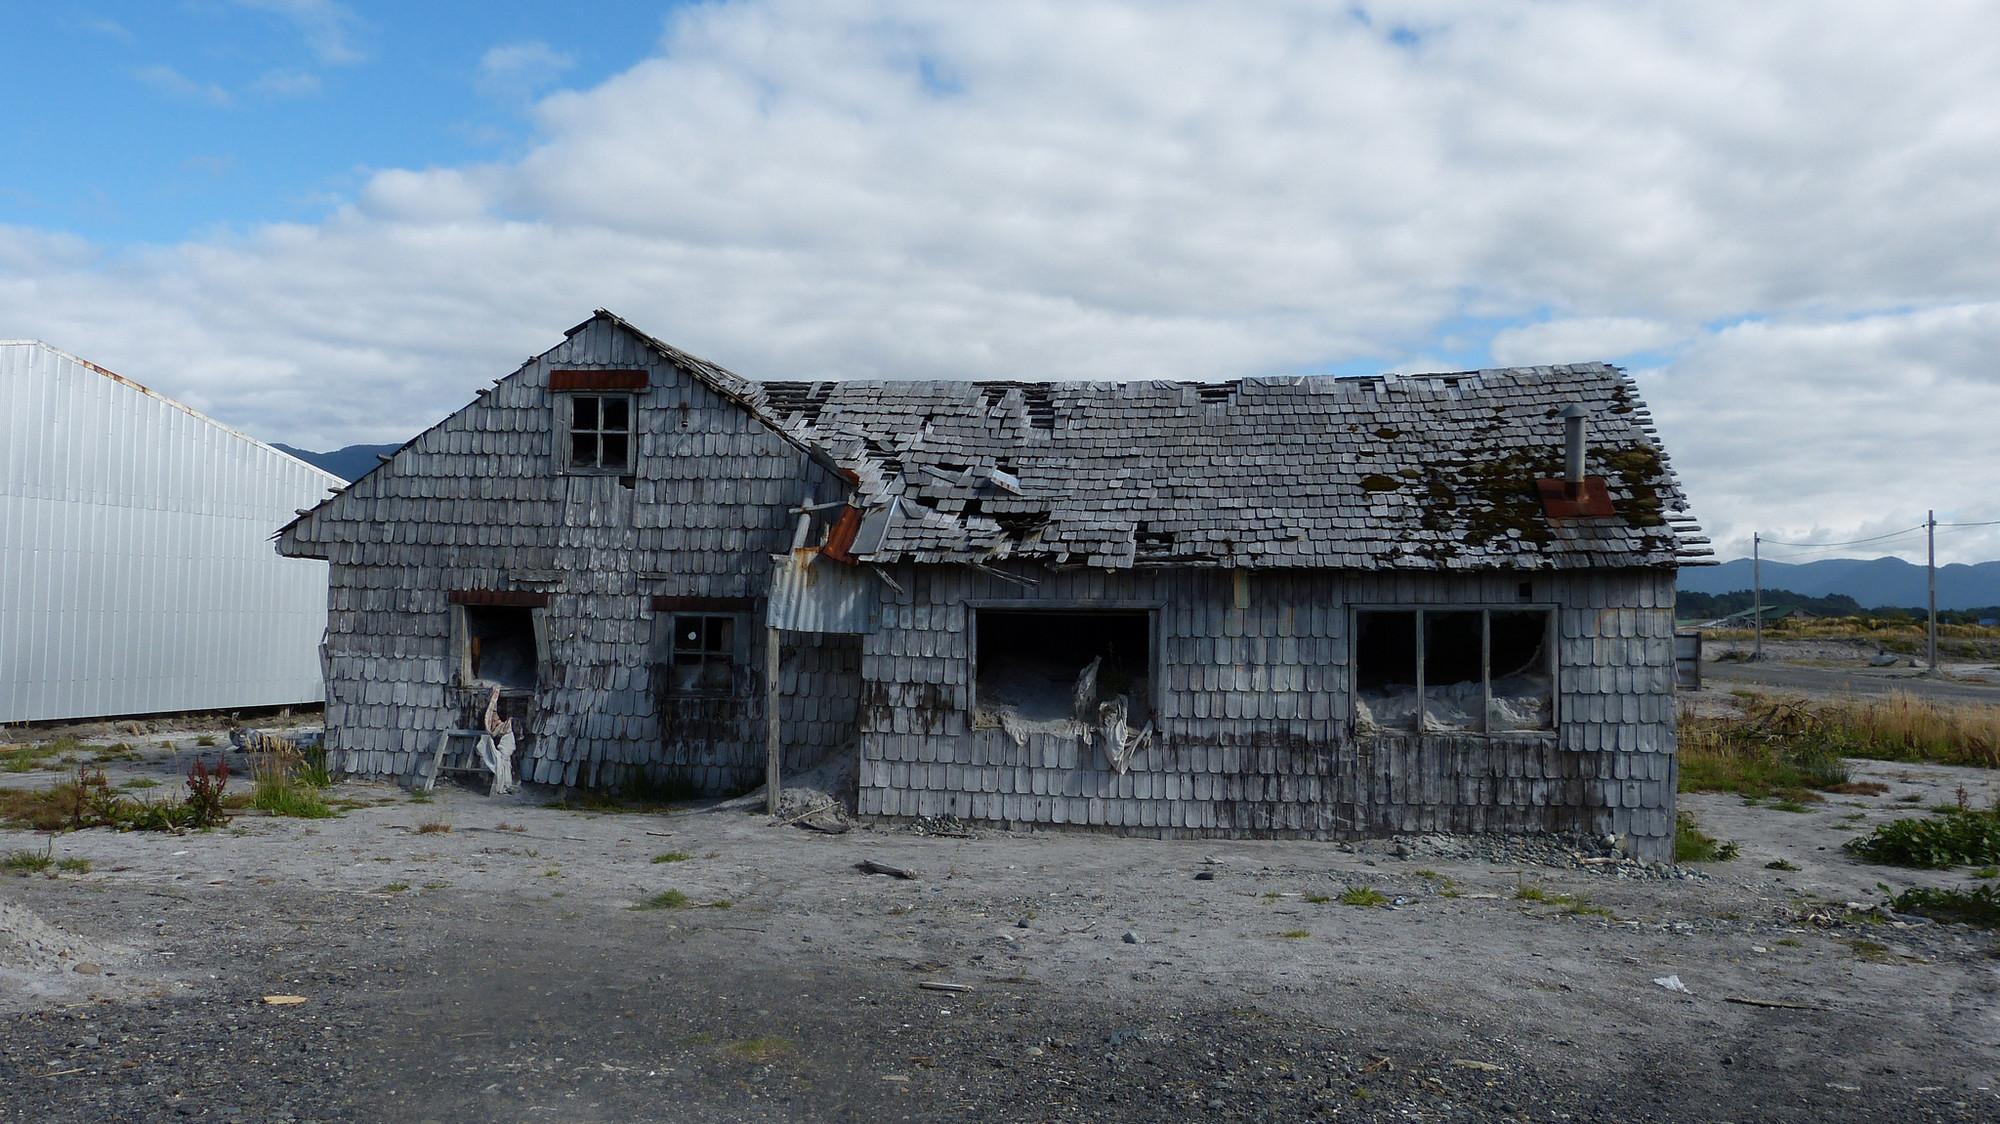 Chaitén tras segunda erupción en 2009. Image © Mariano Mantel [Flickr CC]